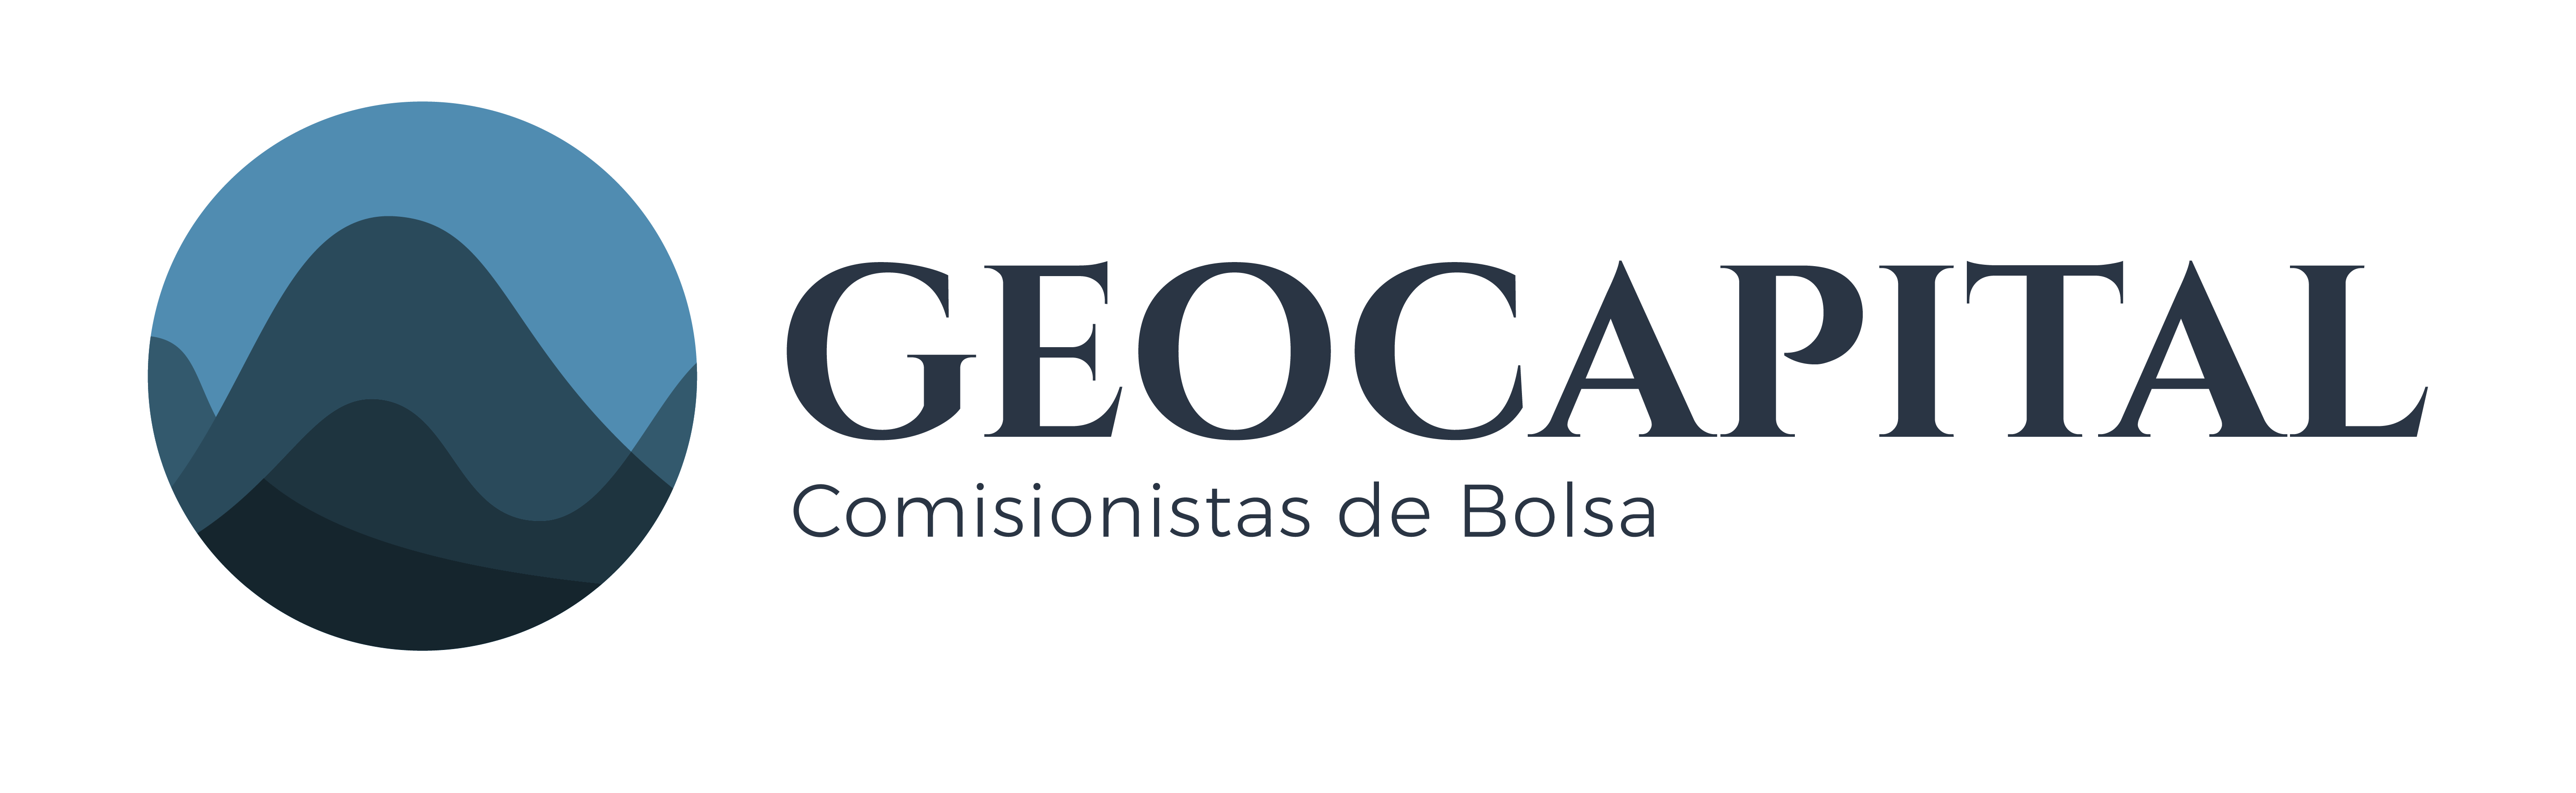 Geocapital